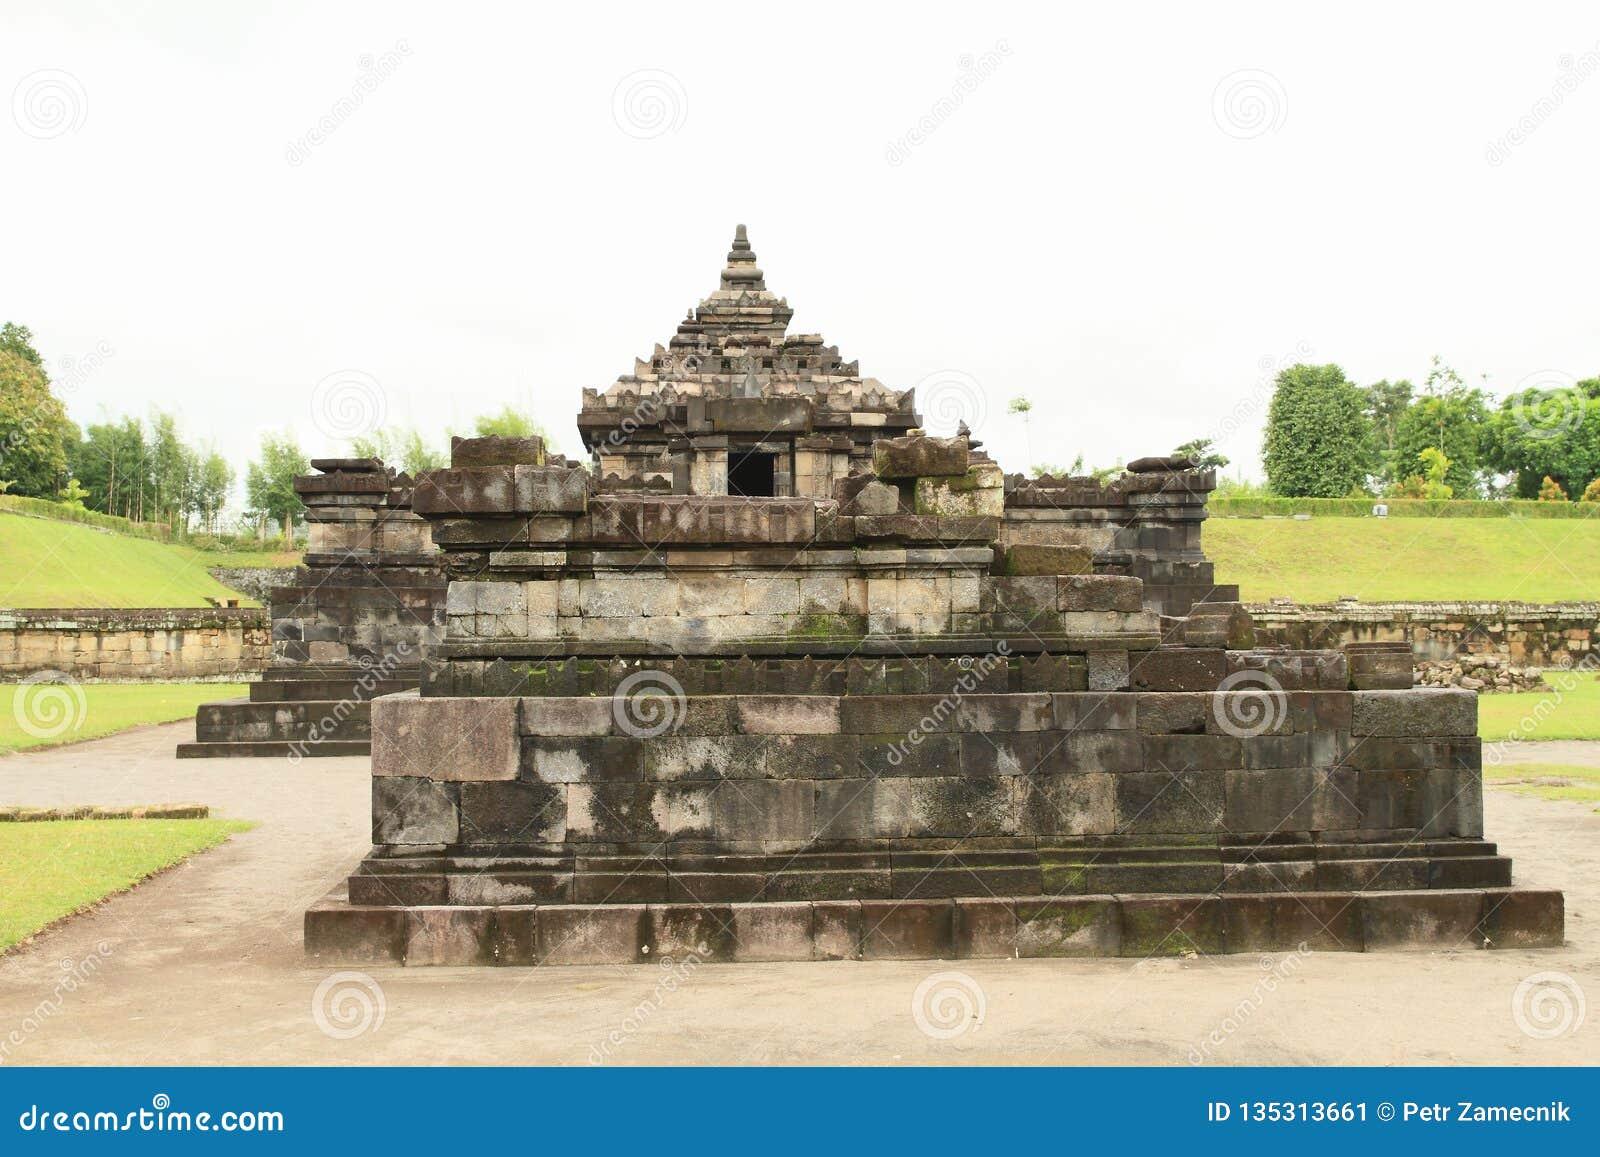 Hindoese tempel Sambisari - centraal deel